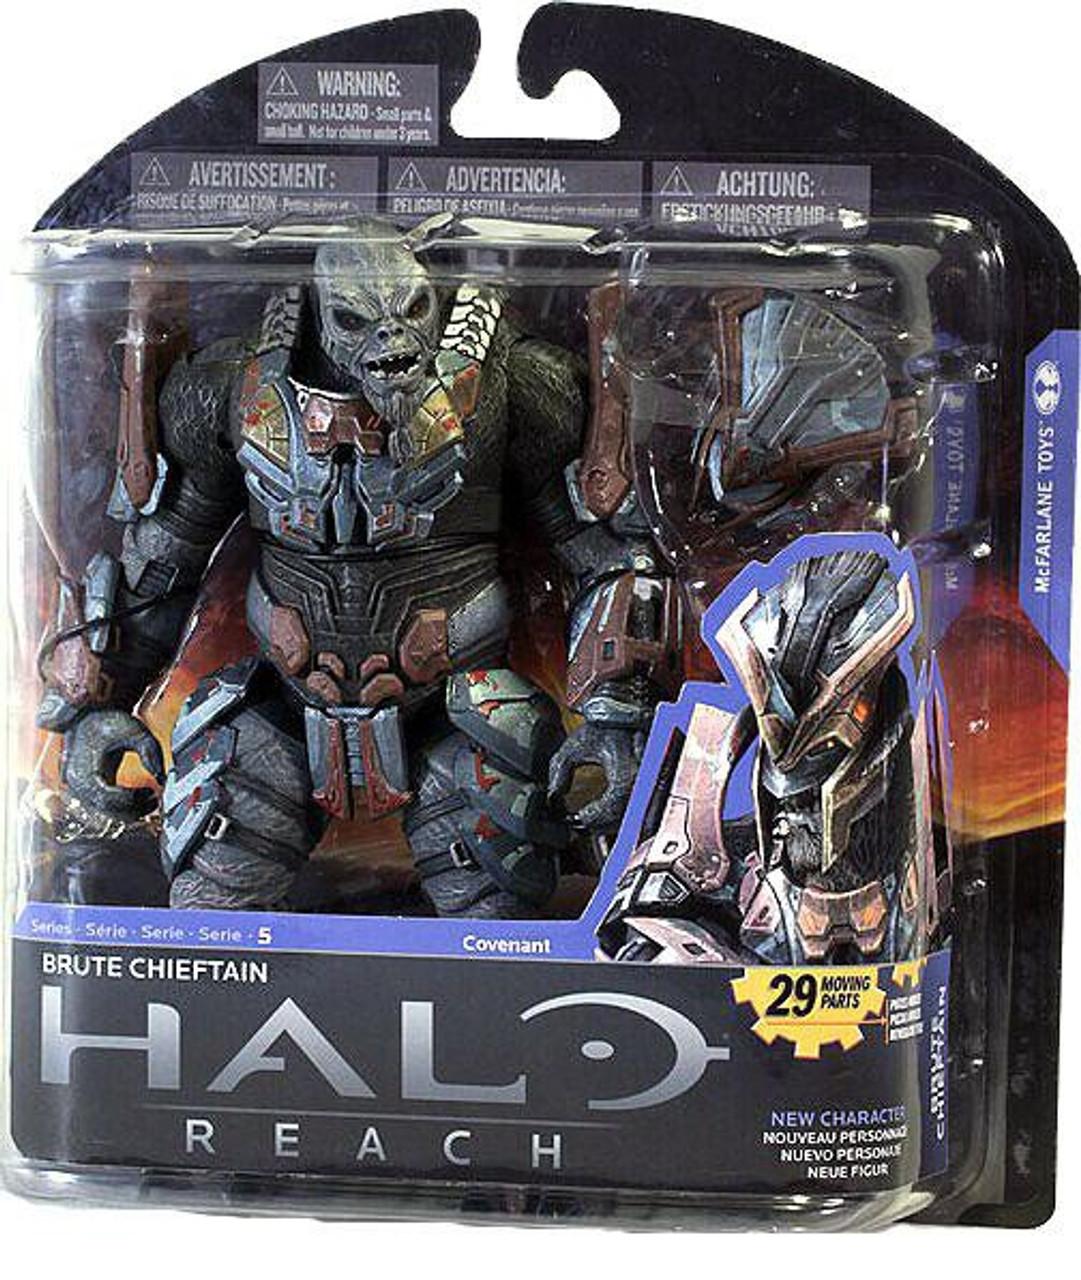 McFarlane Halo Reach Series 4 Brute Minor Covenant